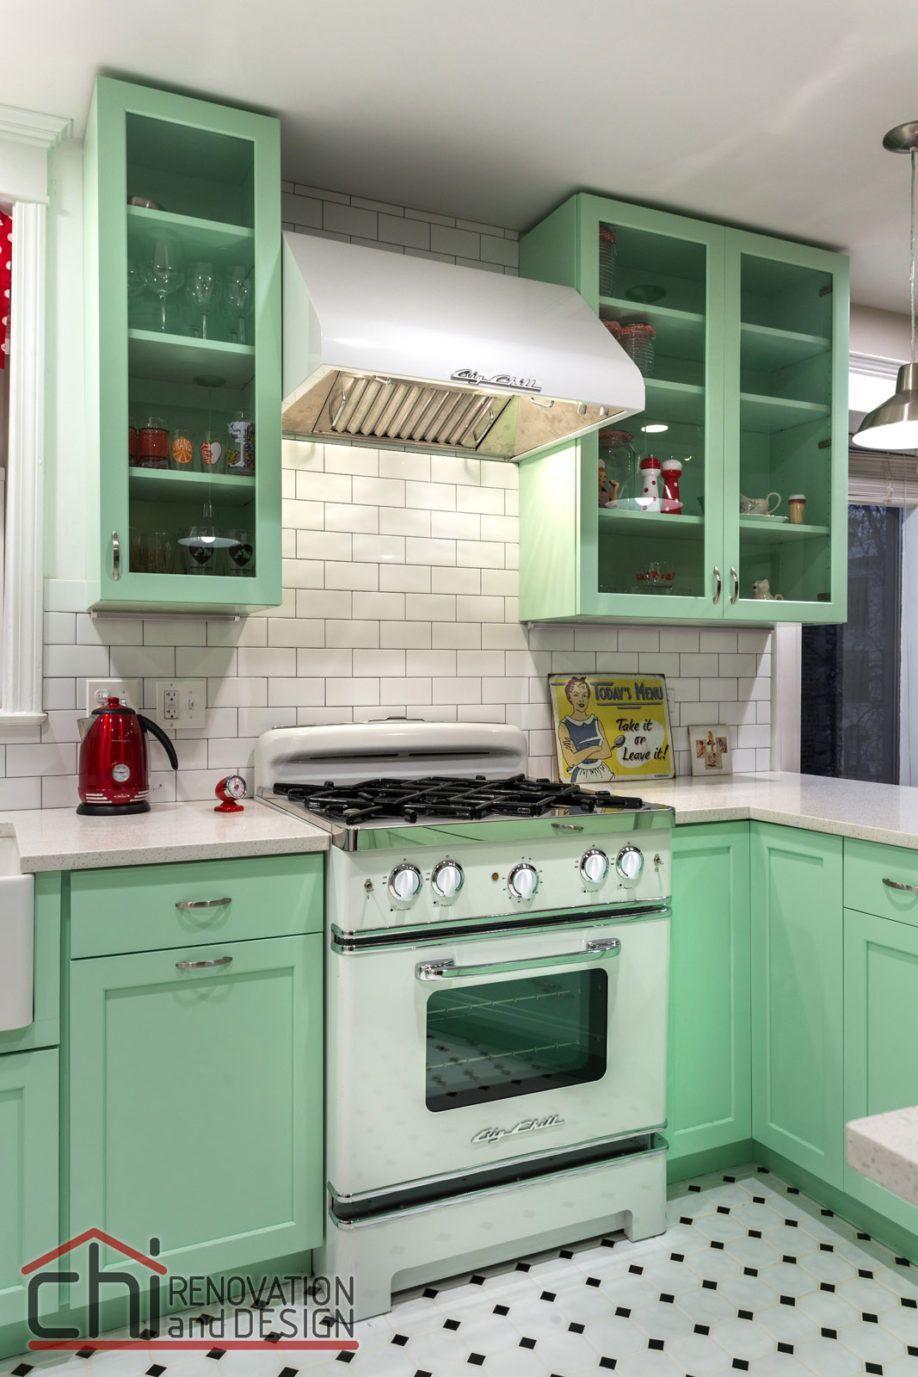 Retro Kitchen Table Yellow 1950 Cabinets 50 S Design Ovens For Sale New Makeovers Pretty 1950s Style Retro Kitchen Tables Modern Kitchen Design Kitchen Remodel